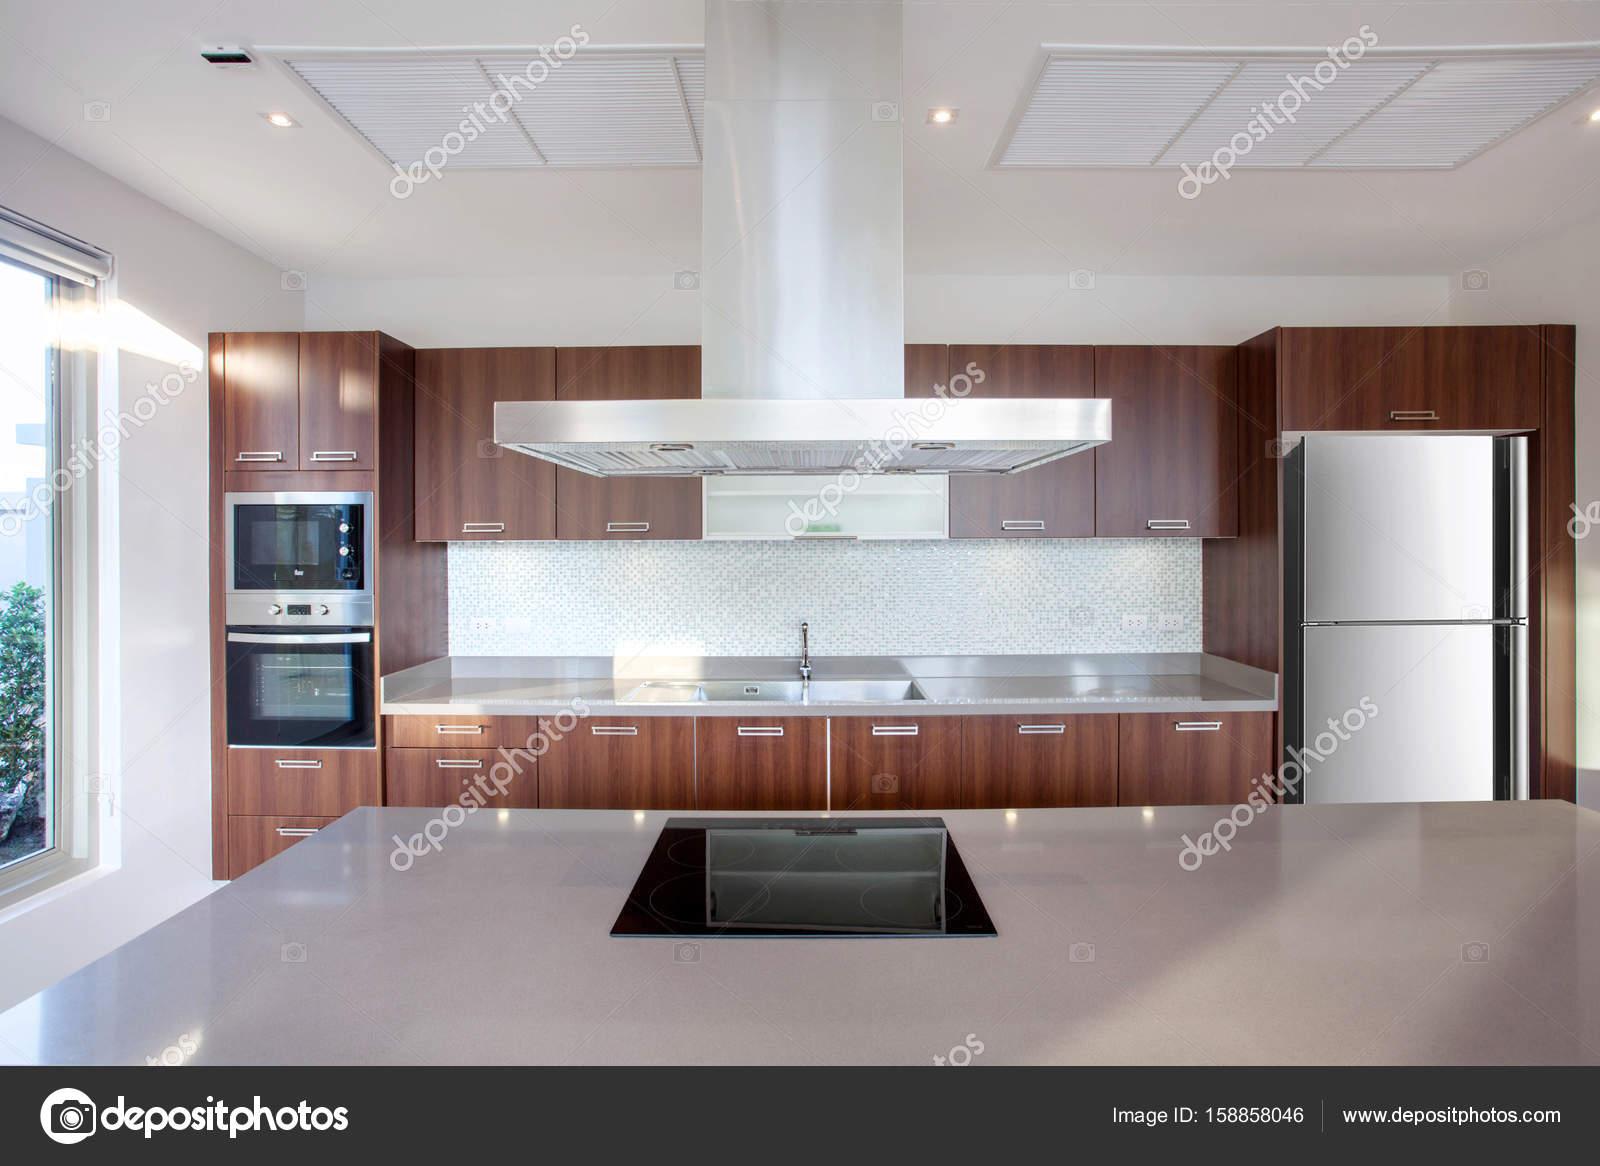 Villa Com Piscina Interior Design De Luxo Na Rea De Cozinha Que